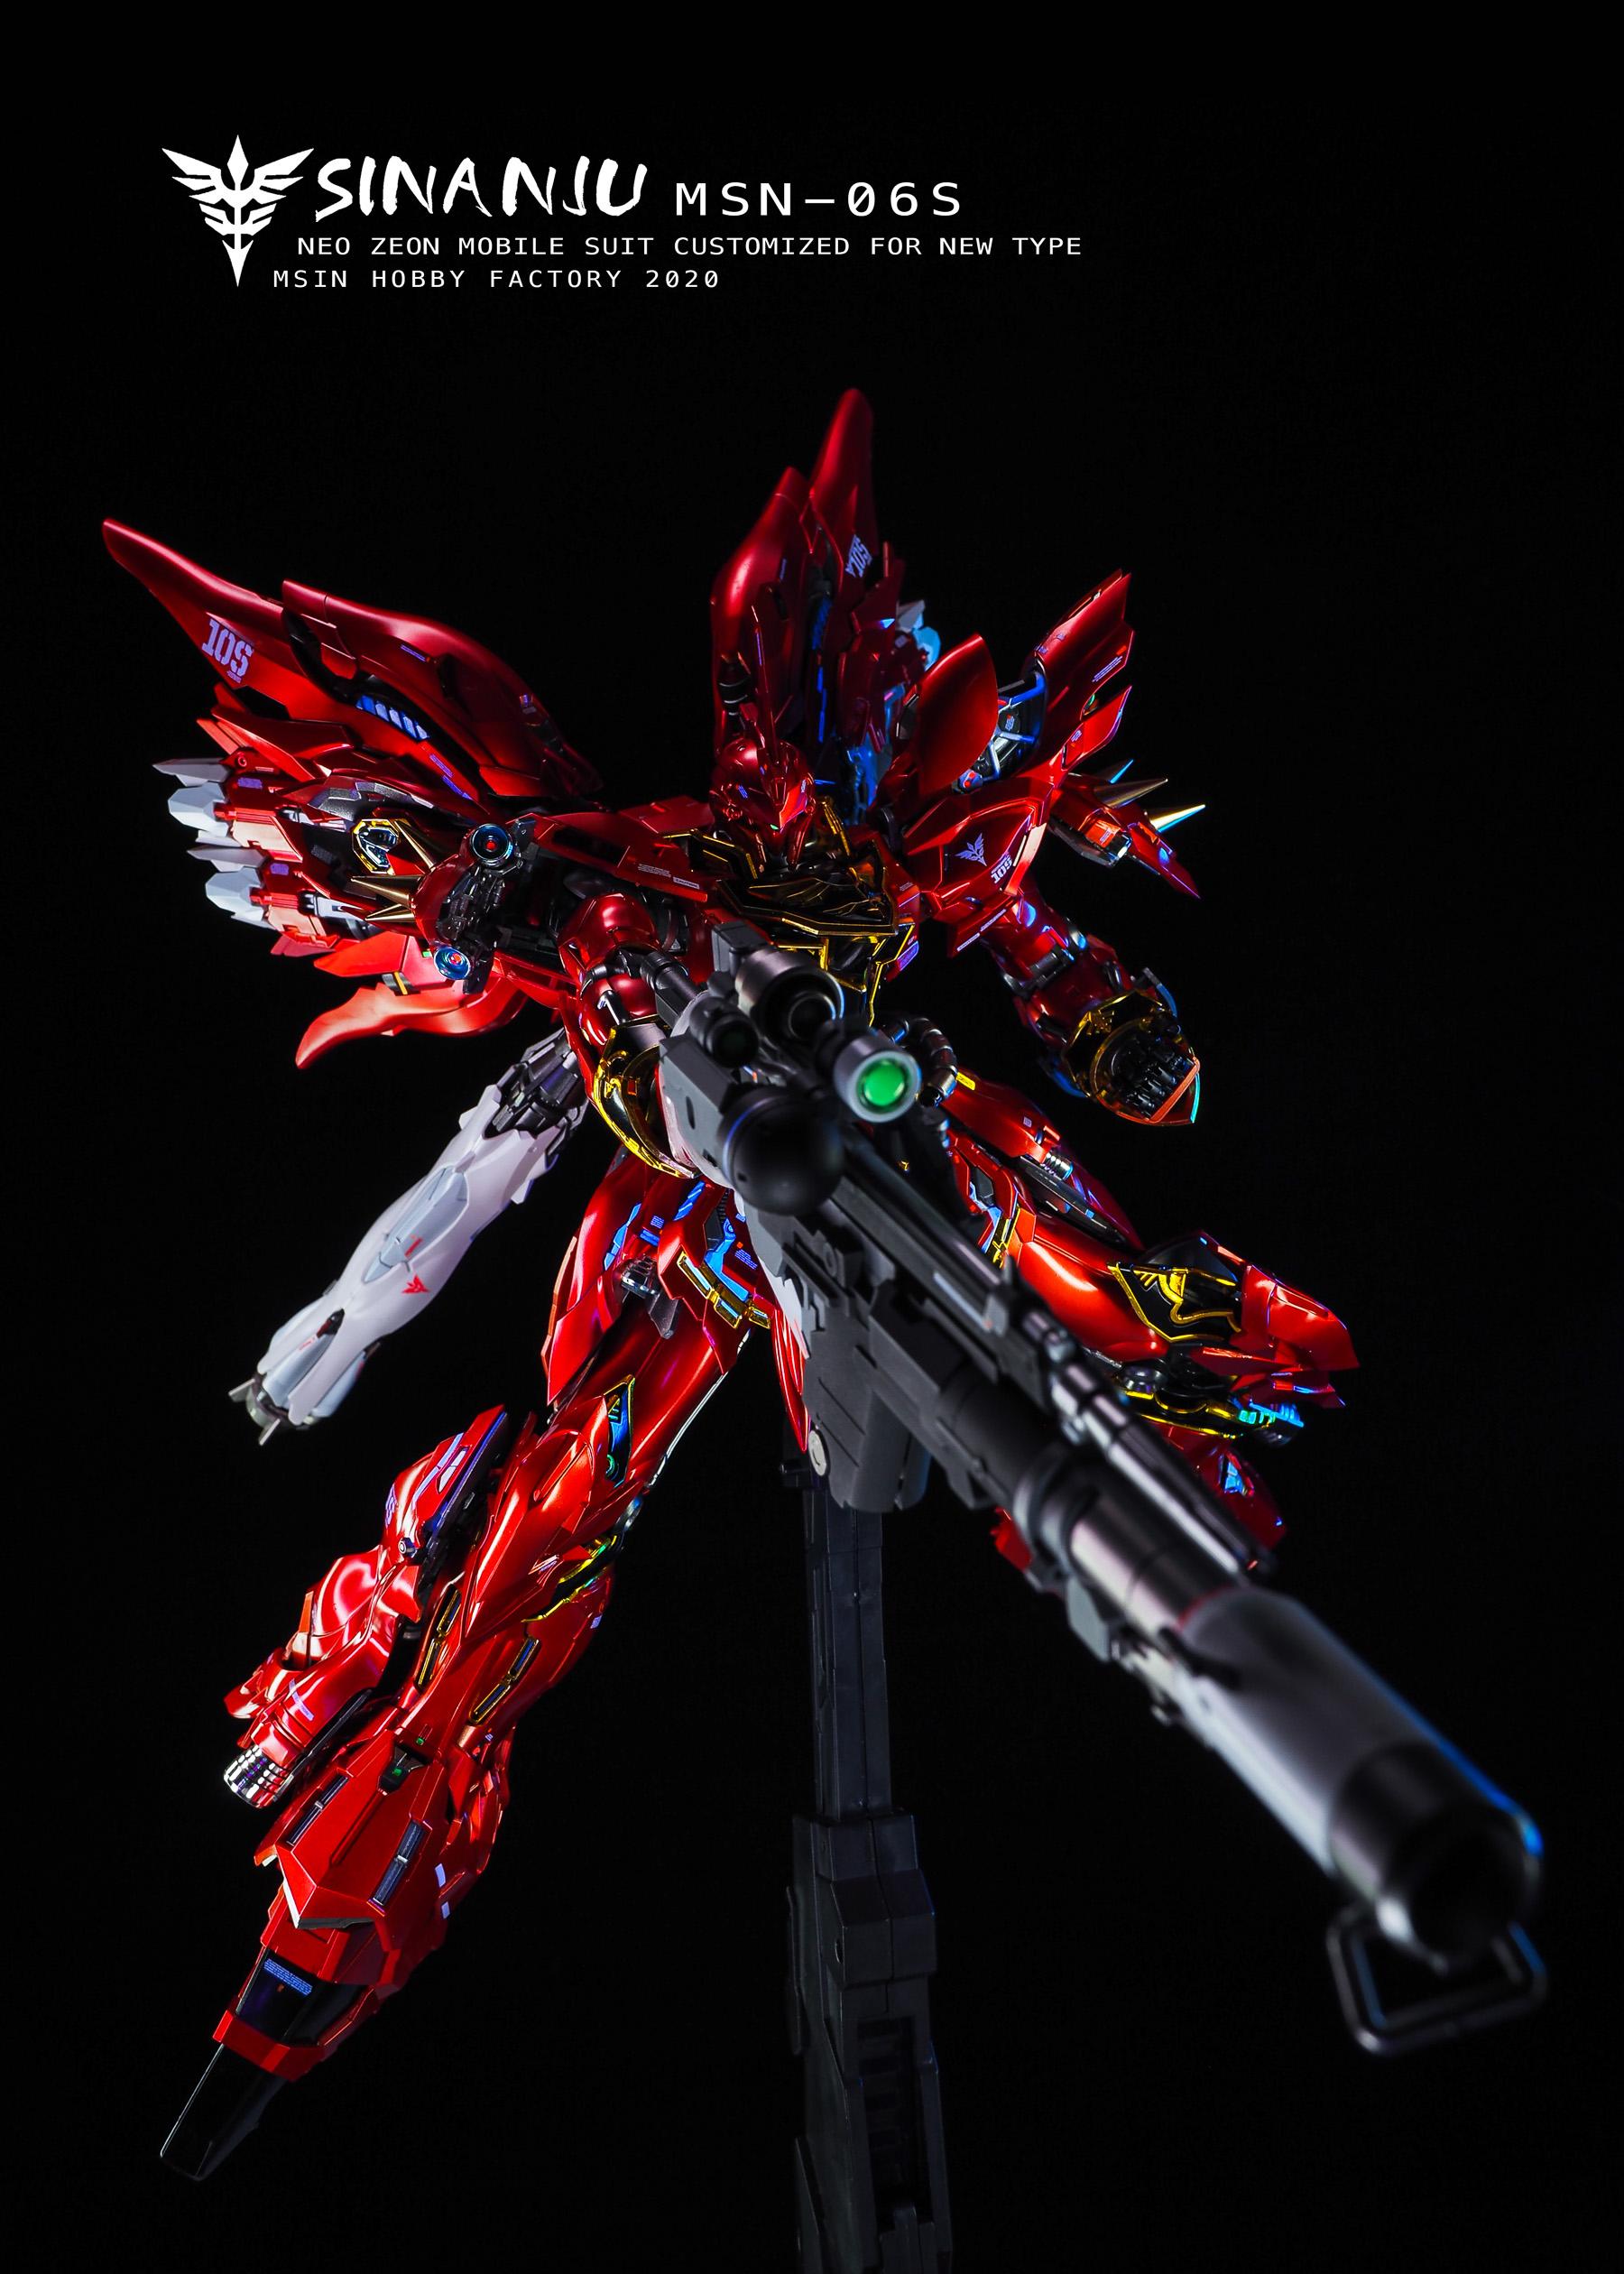 S437_6_takumi_sinanju_red_019.jpg